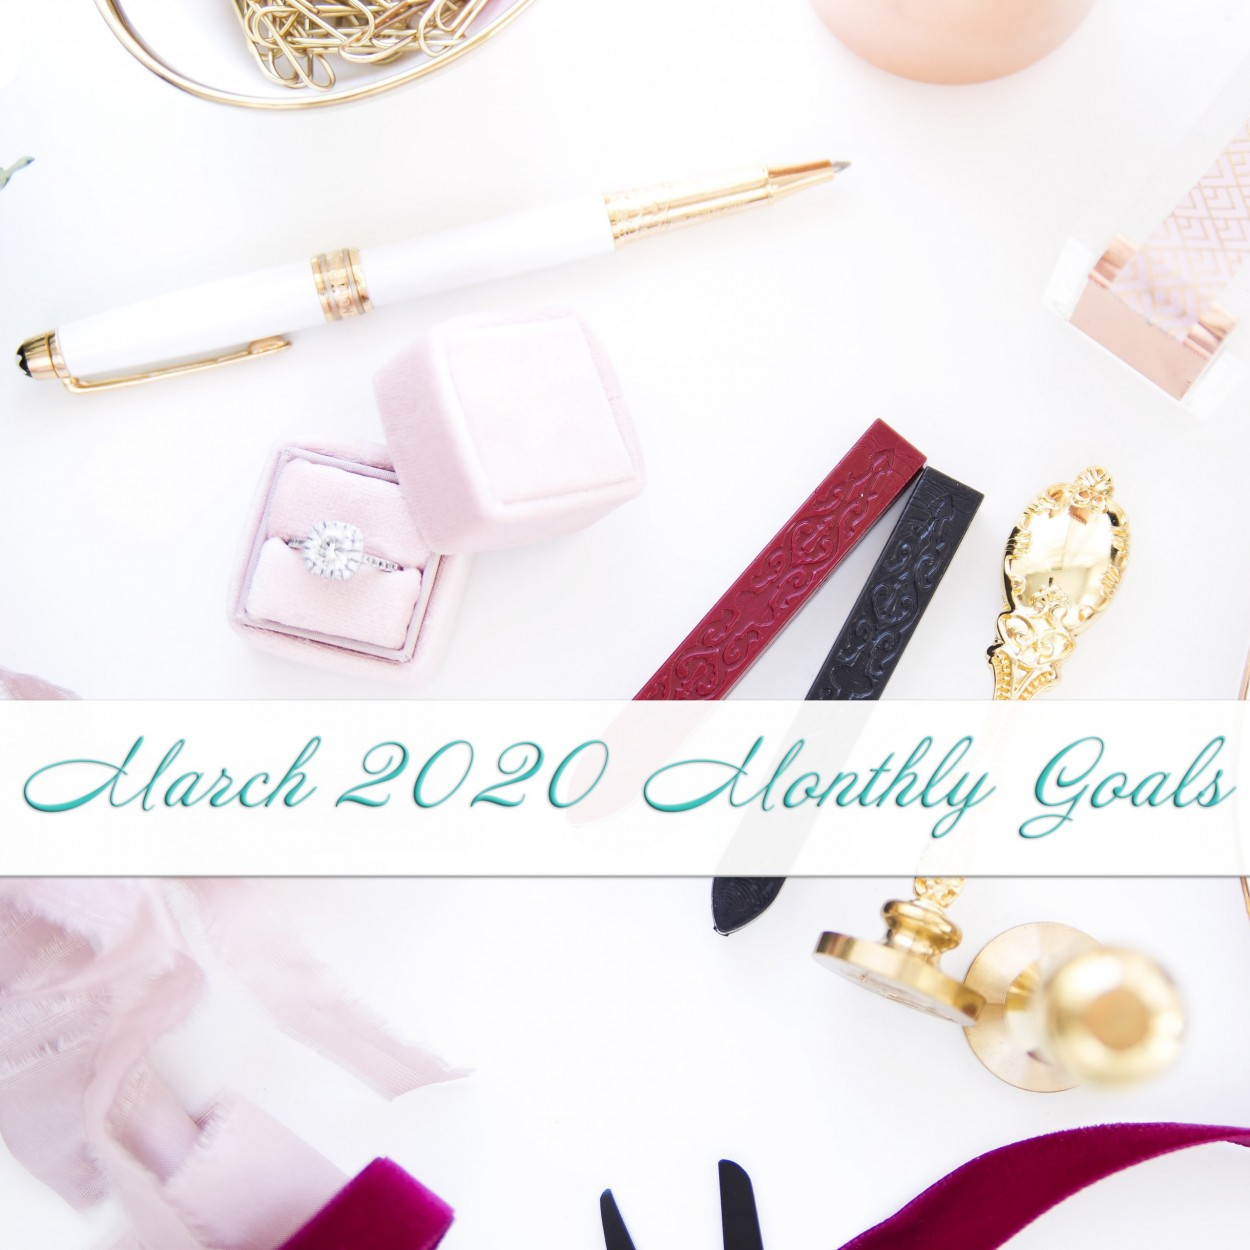 March 2020 Goals